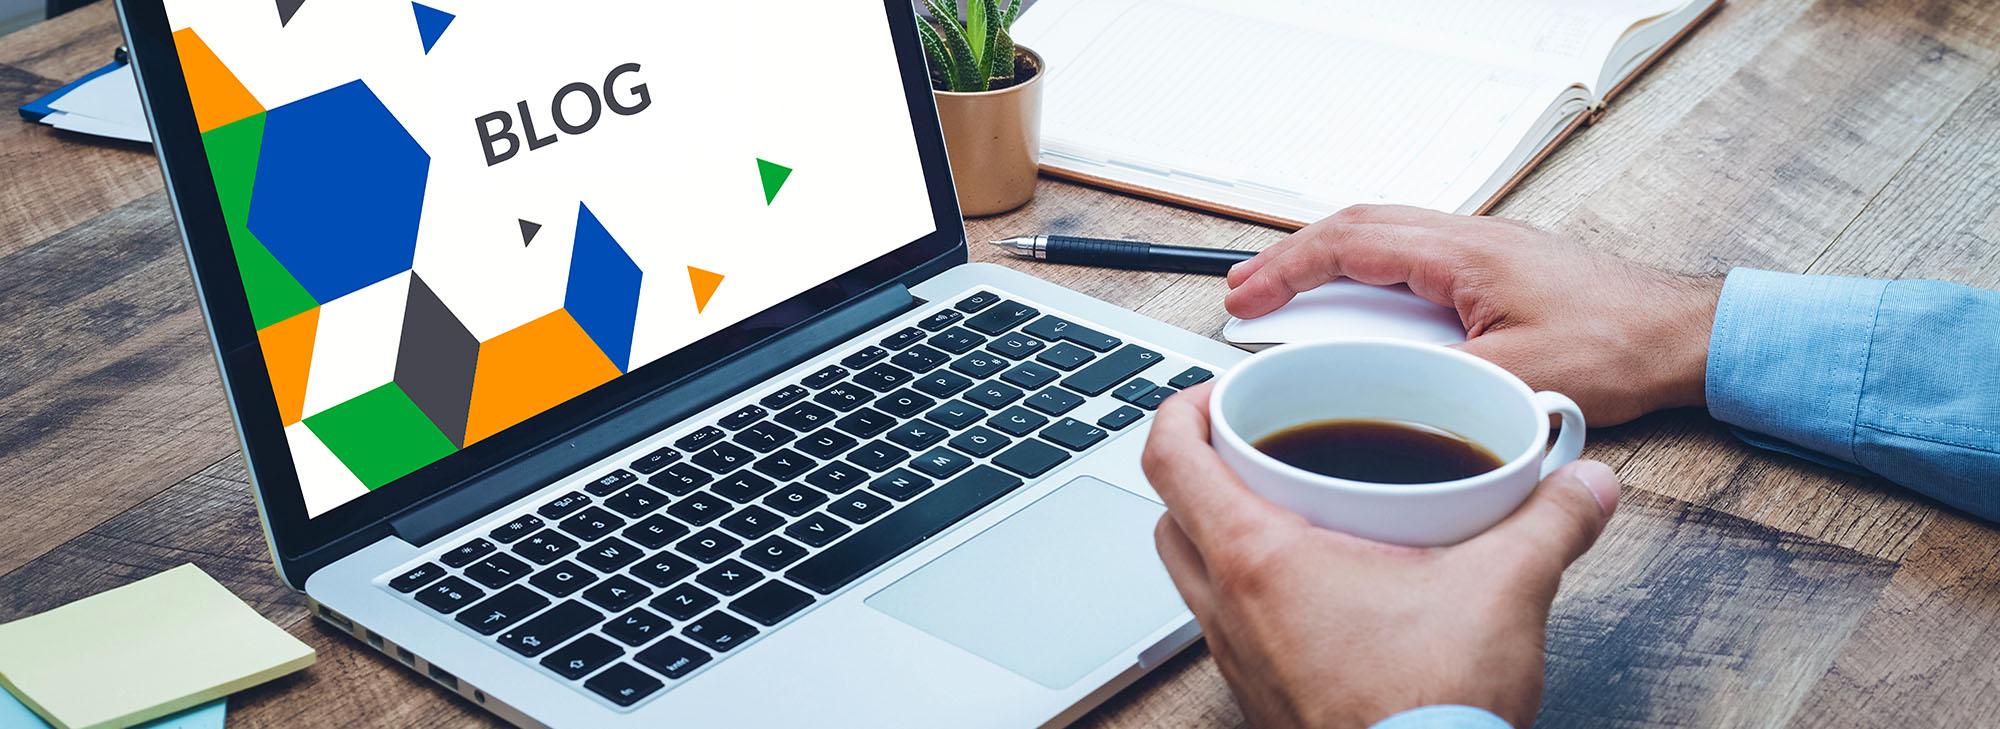 man at work reading blog on laptop while drinking coffee